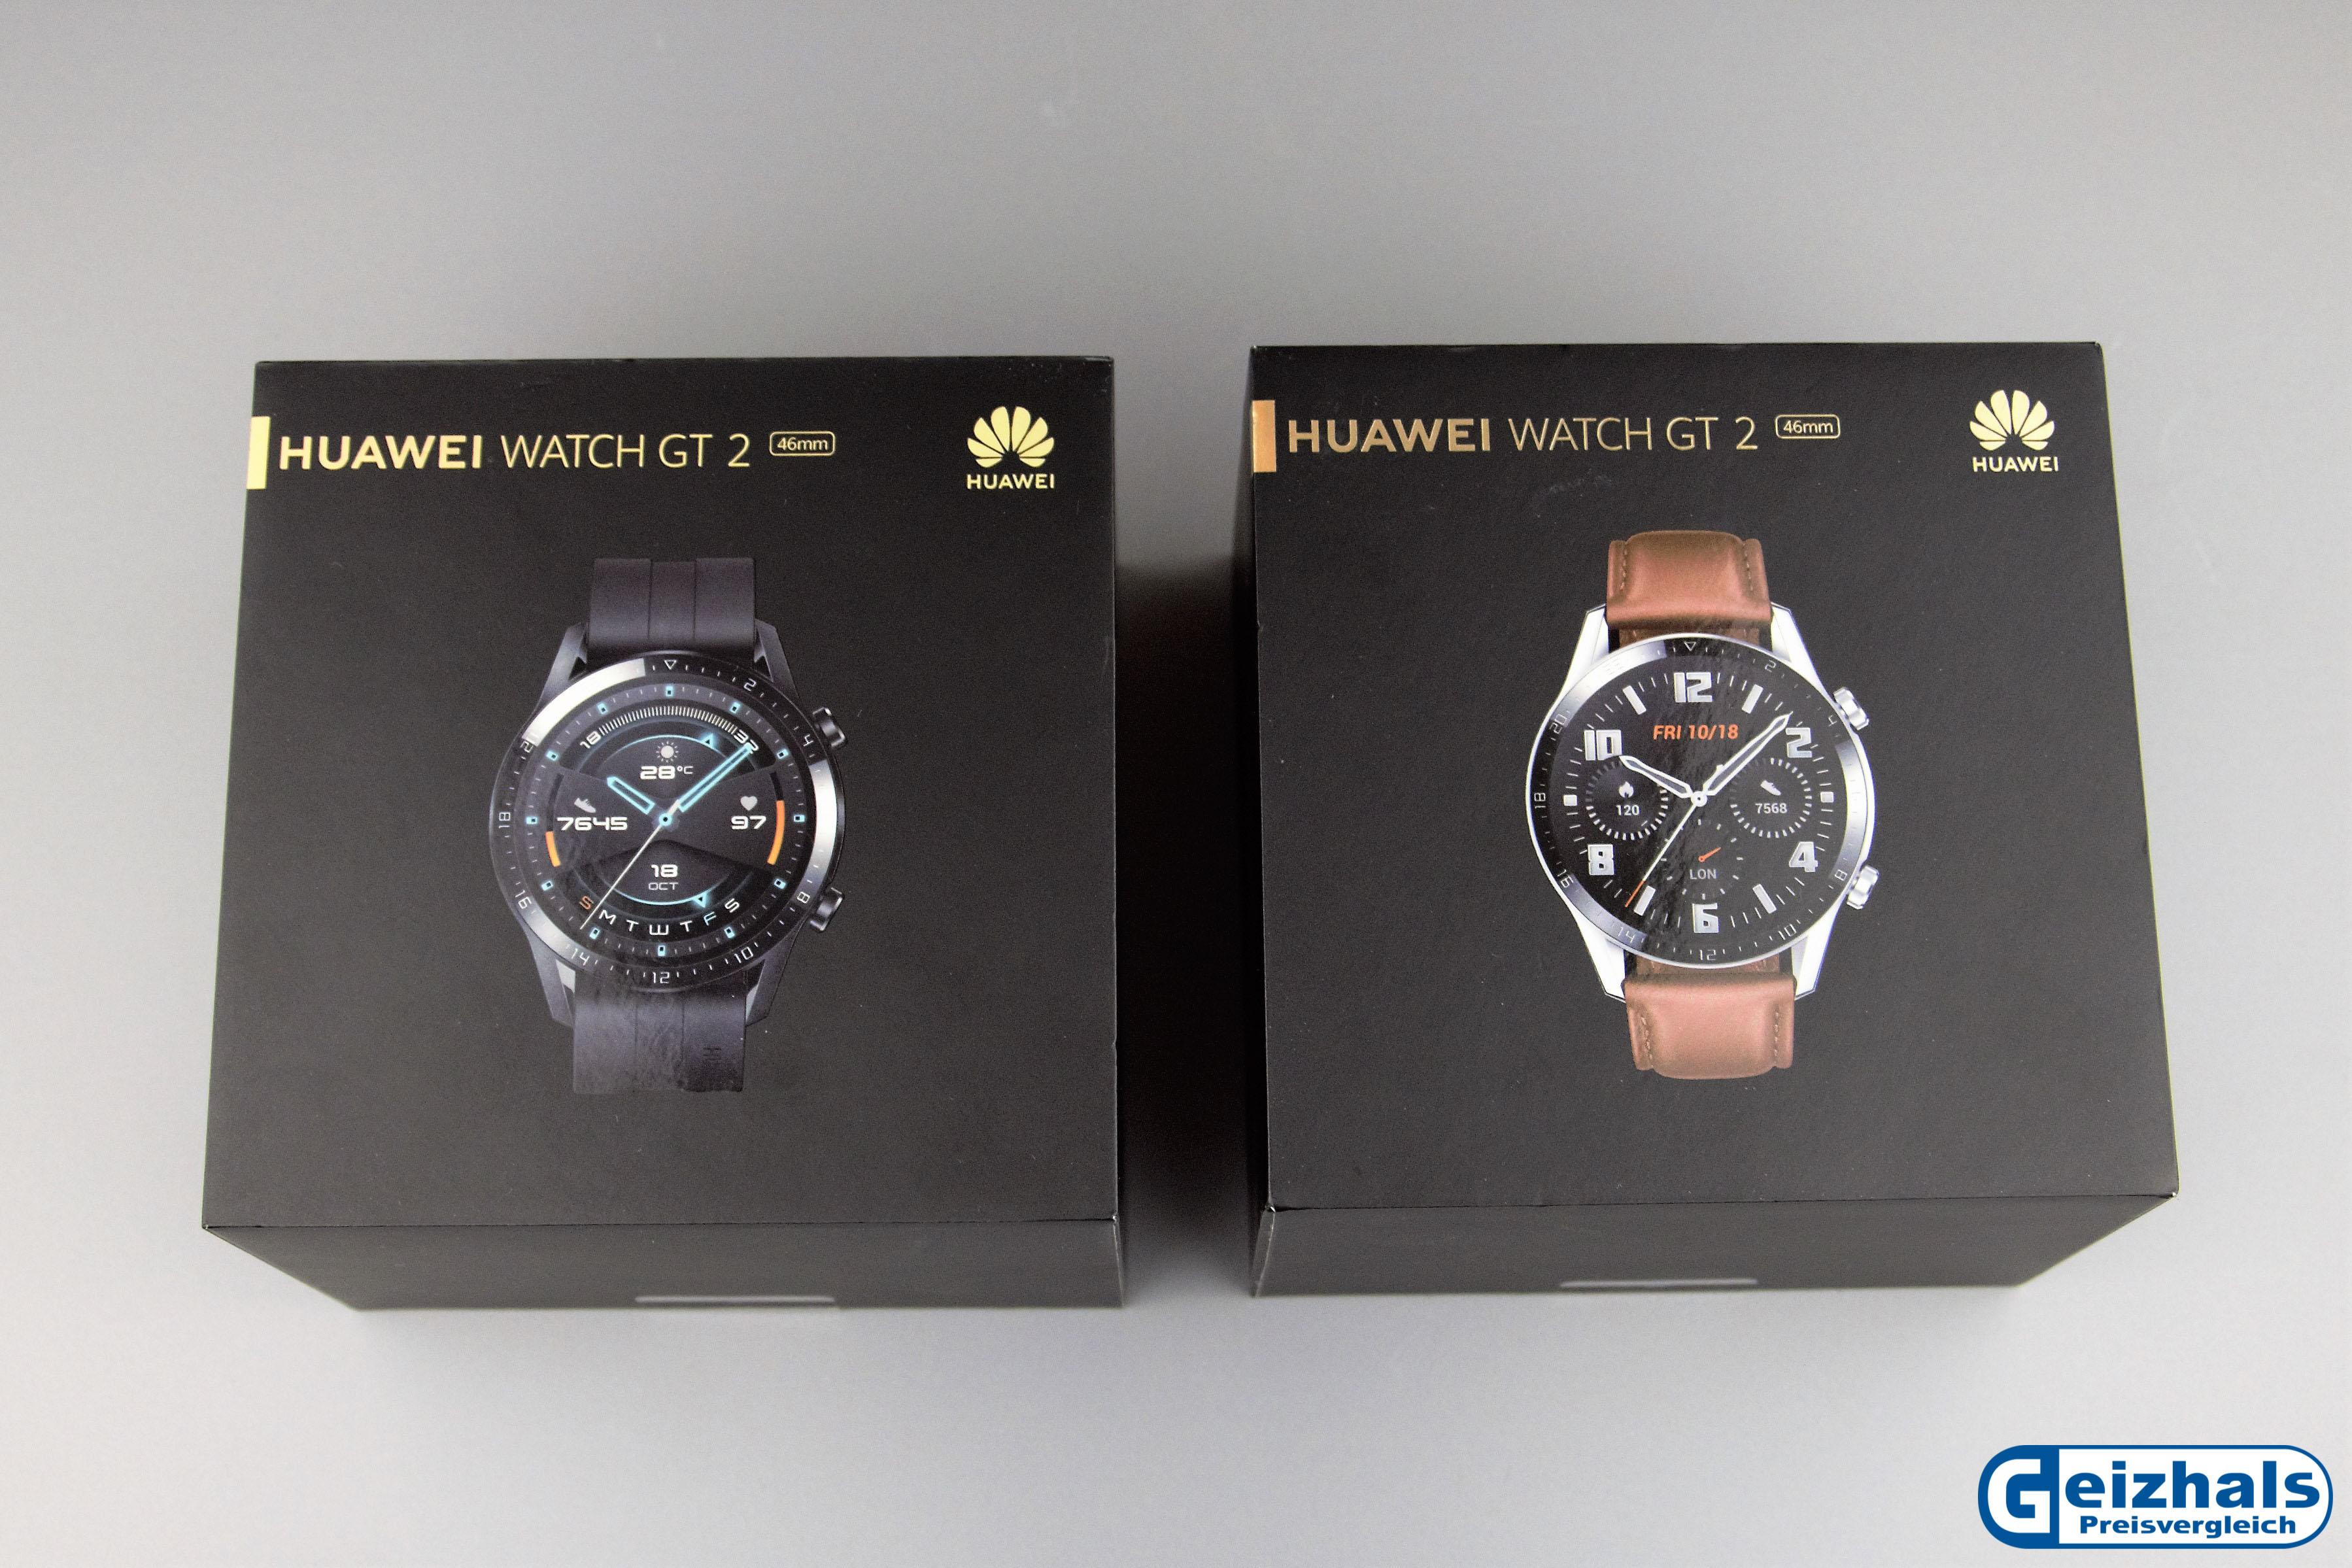 Verpackung der Huawei Watch GT 2